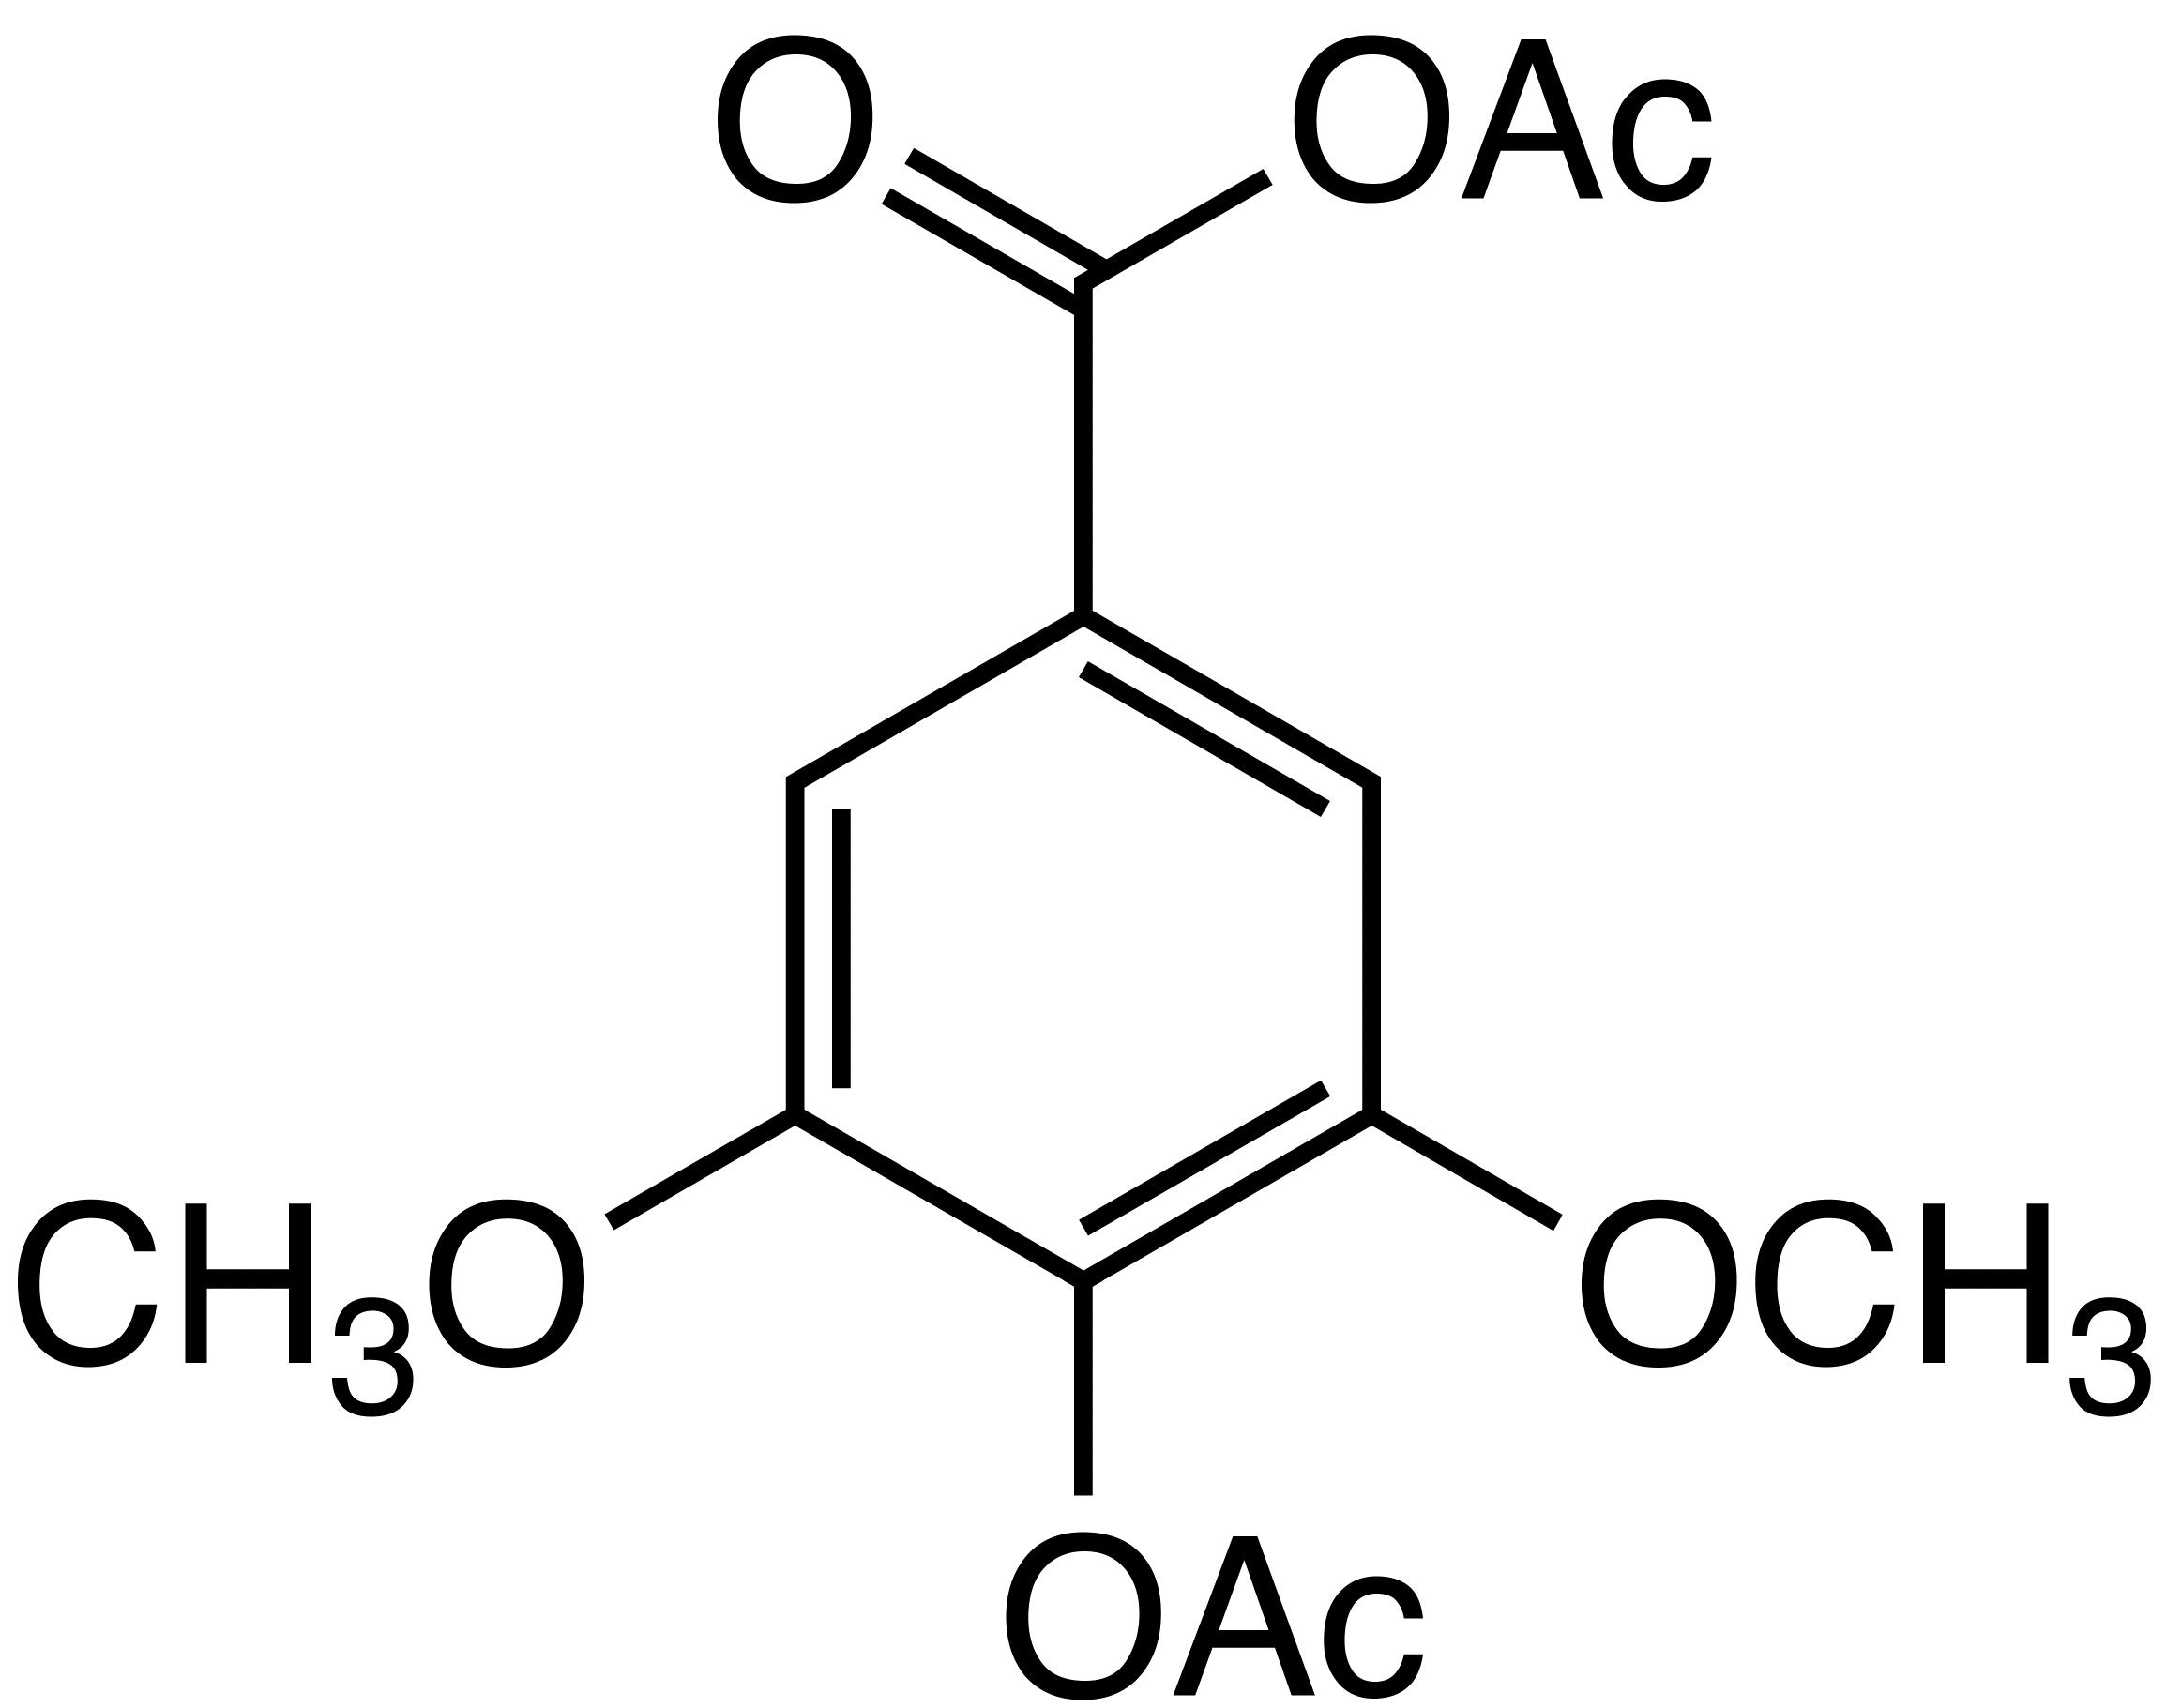 Bmse010103 syringic acid acetate at bmrb syringic acid acetate image pooptronica